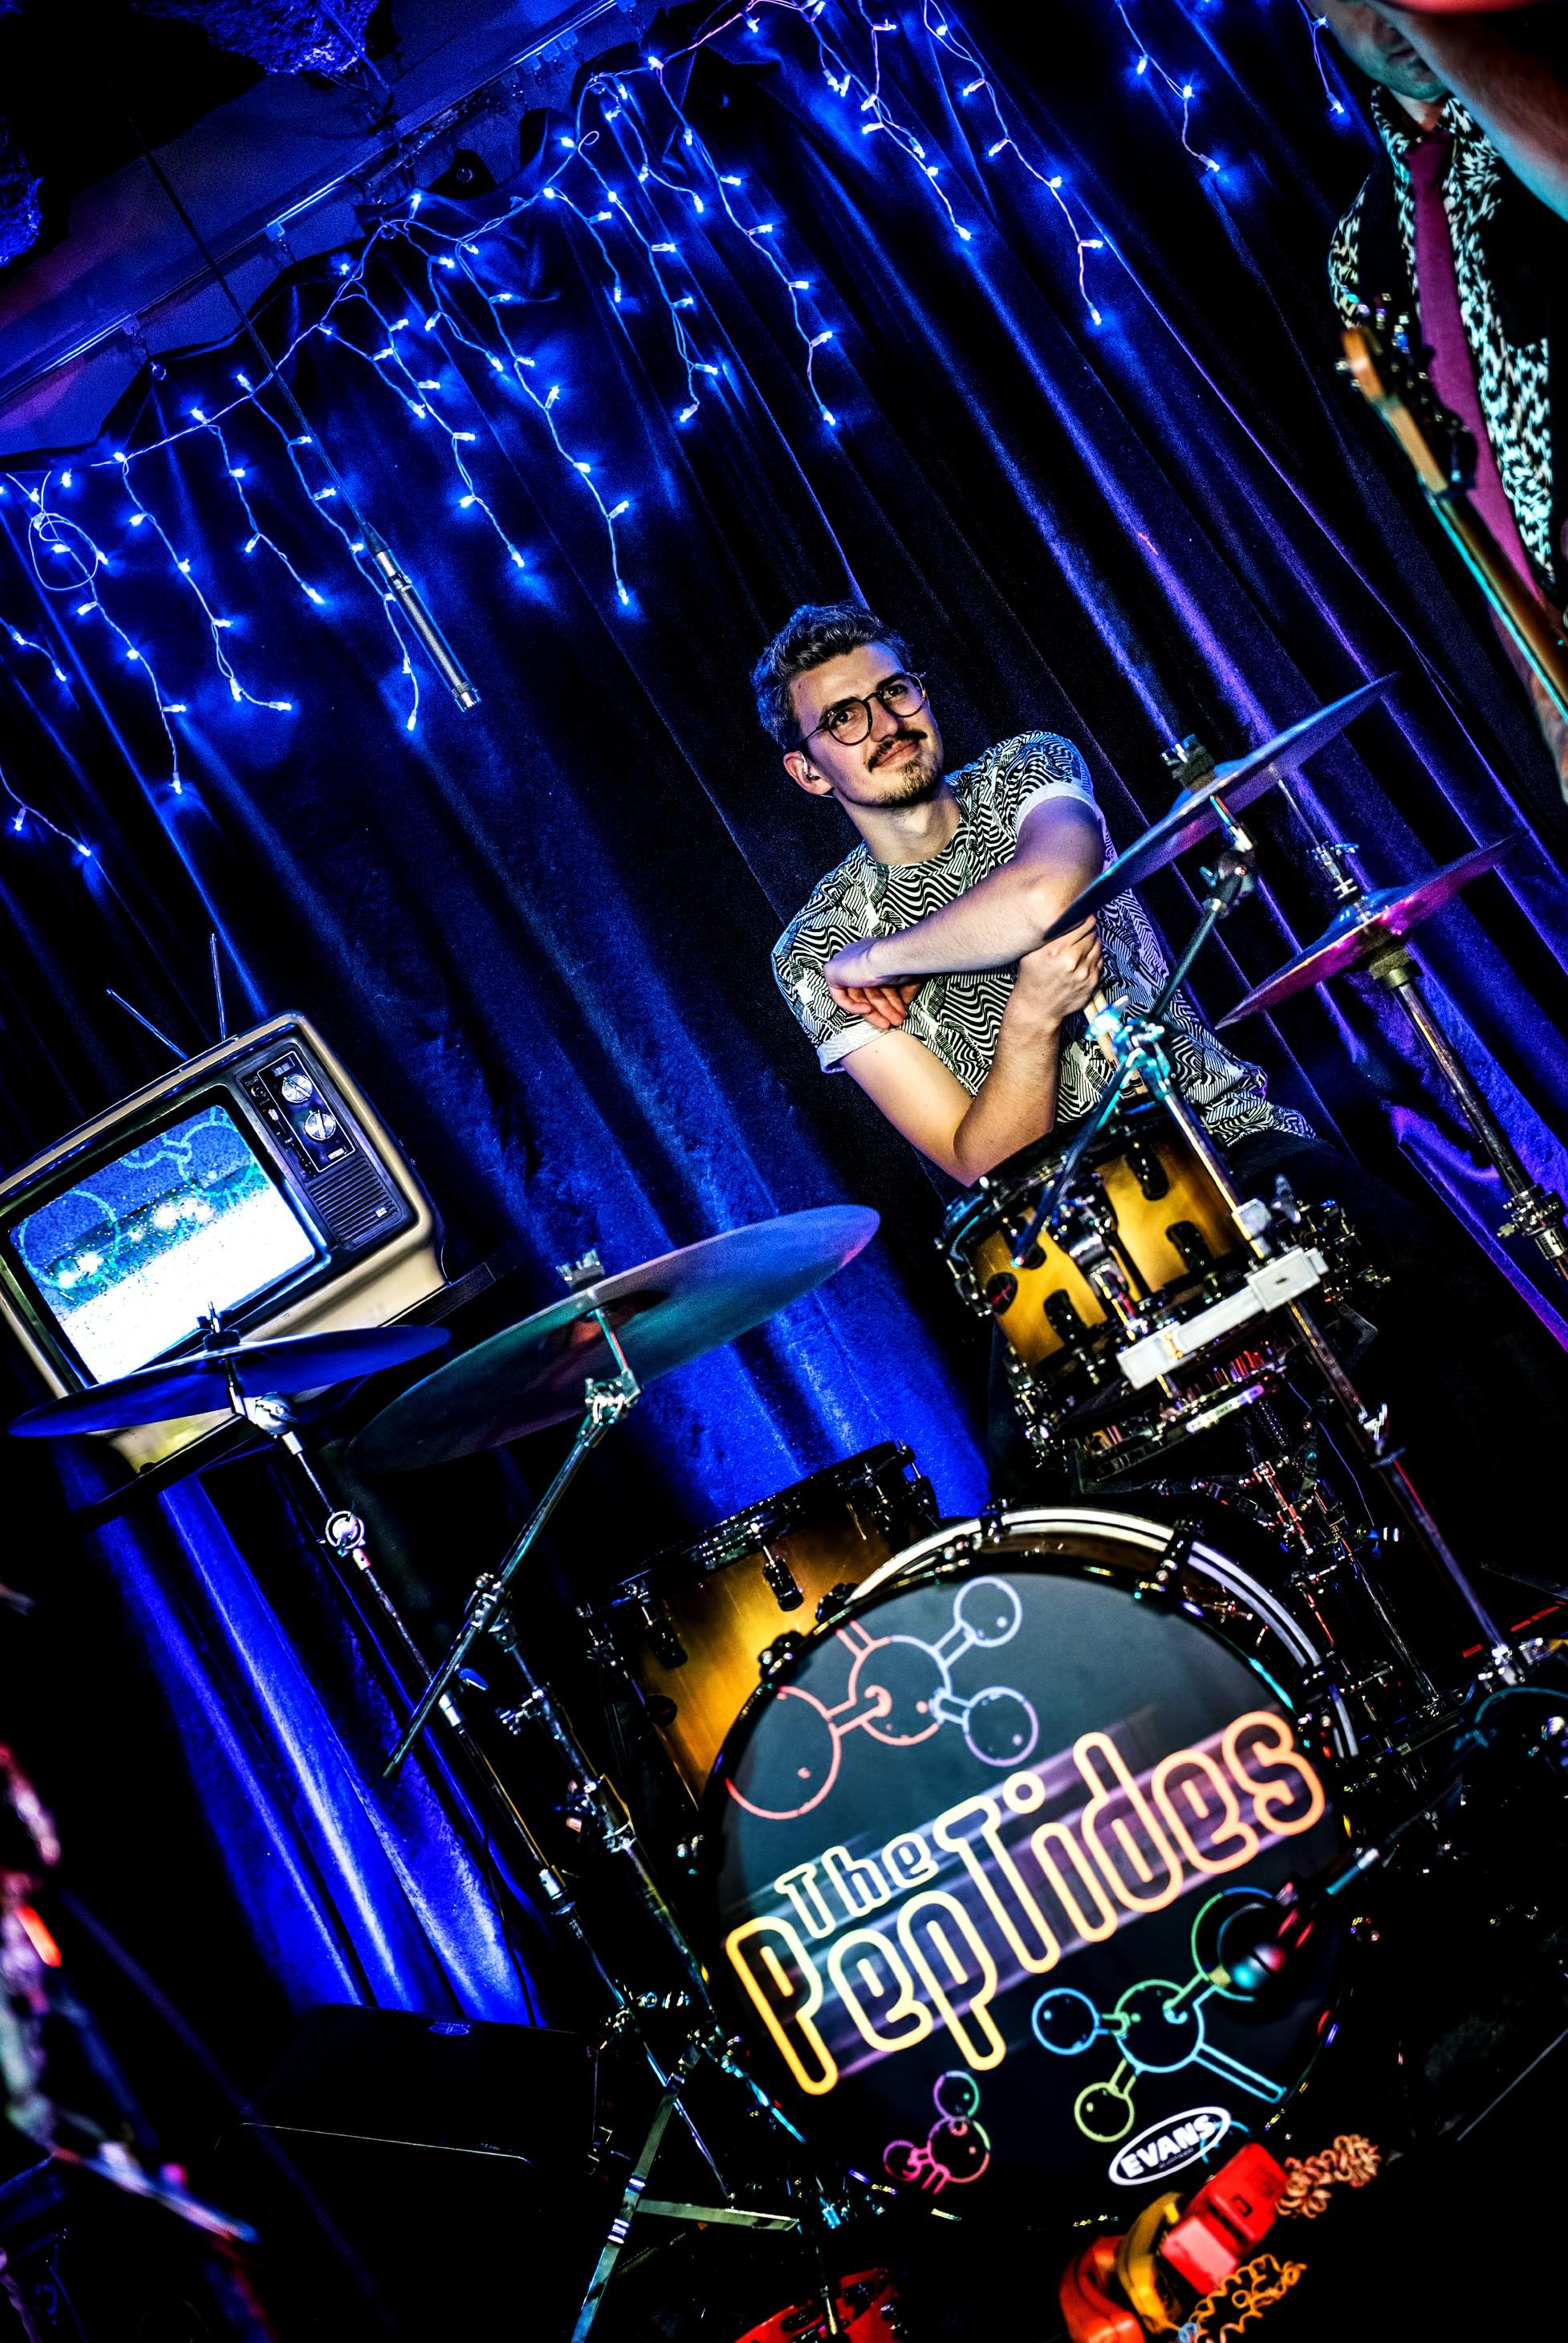 The PepTides - 2016-12-10 - LIVE on Elgin - Credit Helen Kriemadis